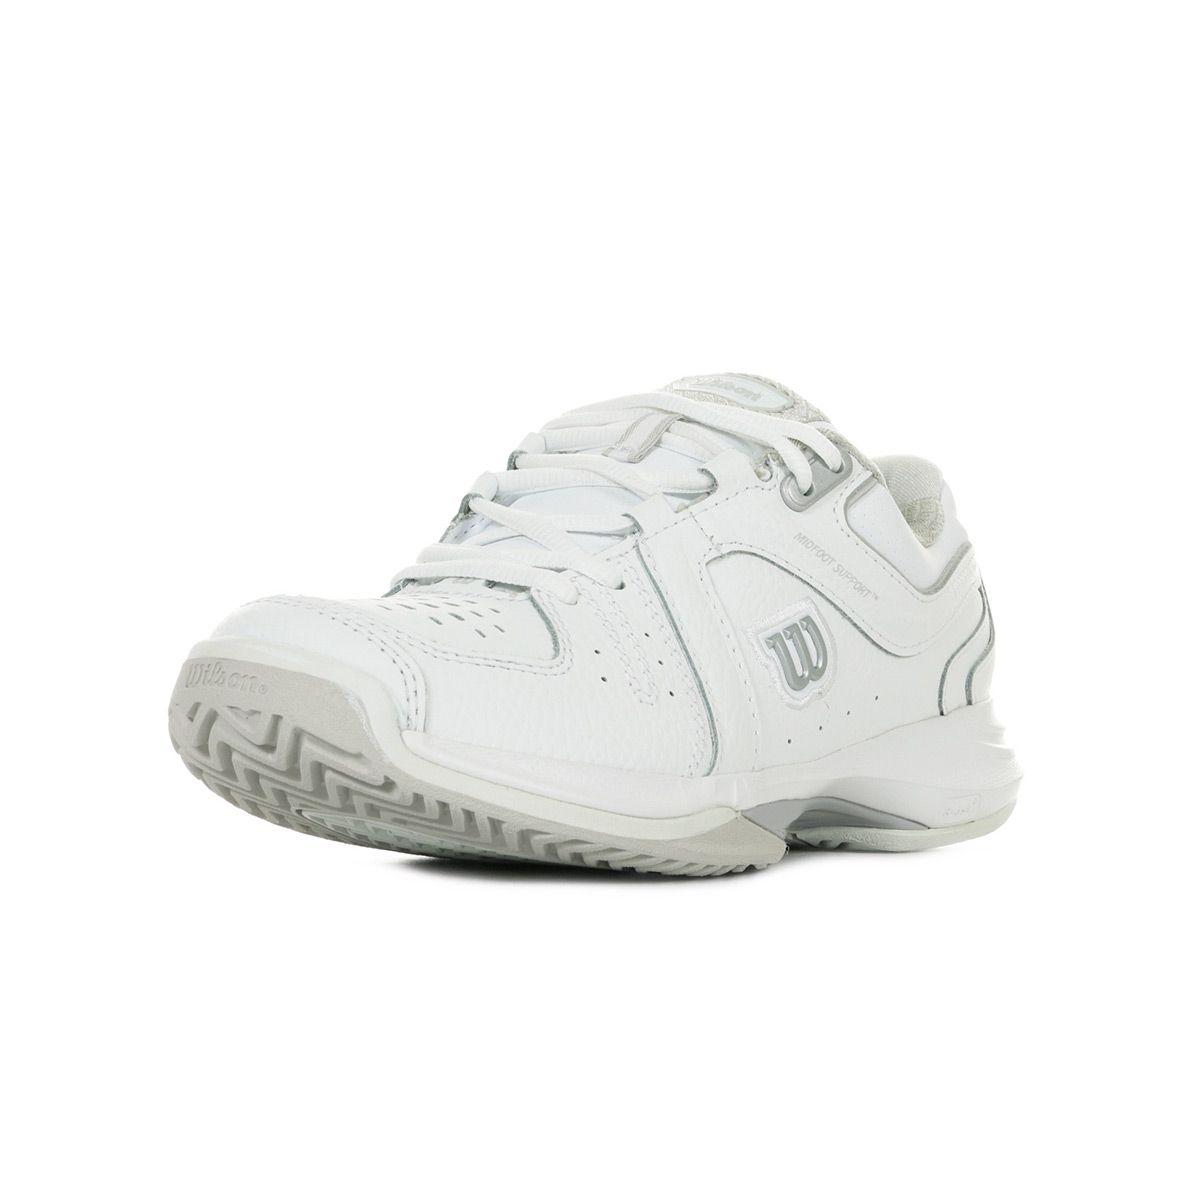 Chaussures de tennis NVision Premium Wn's